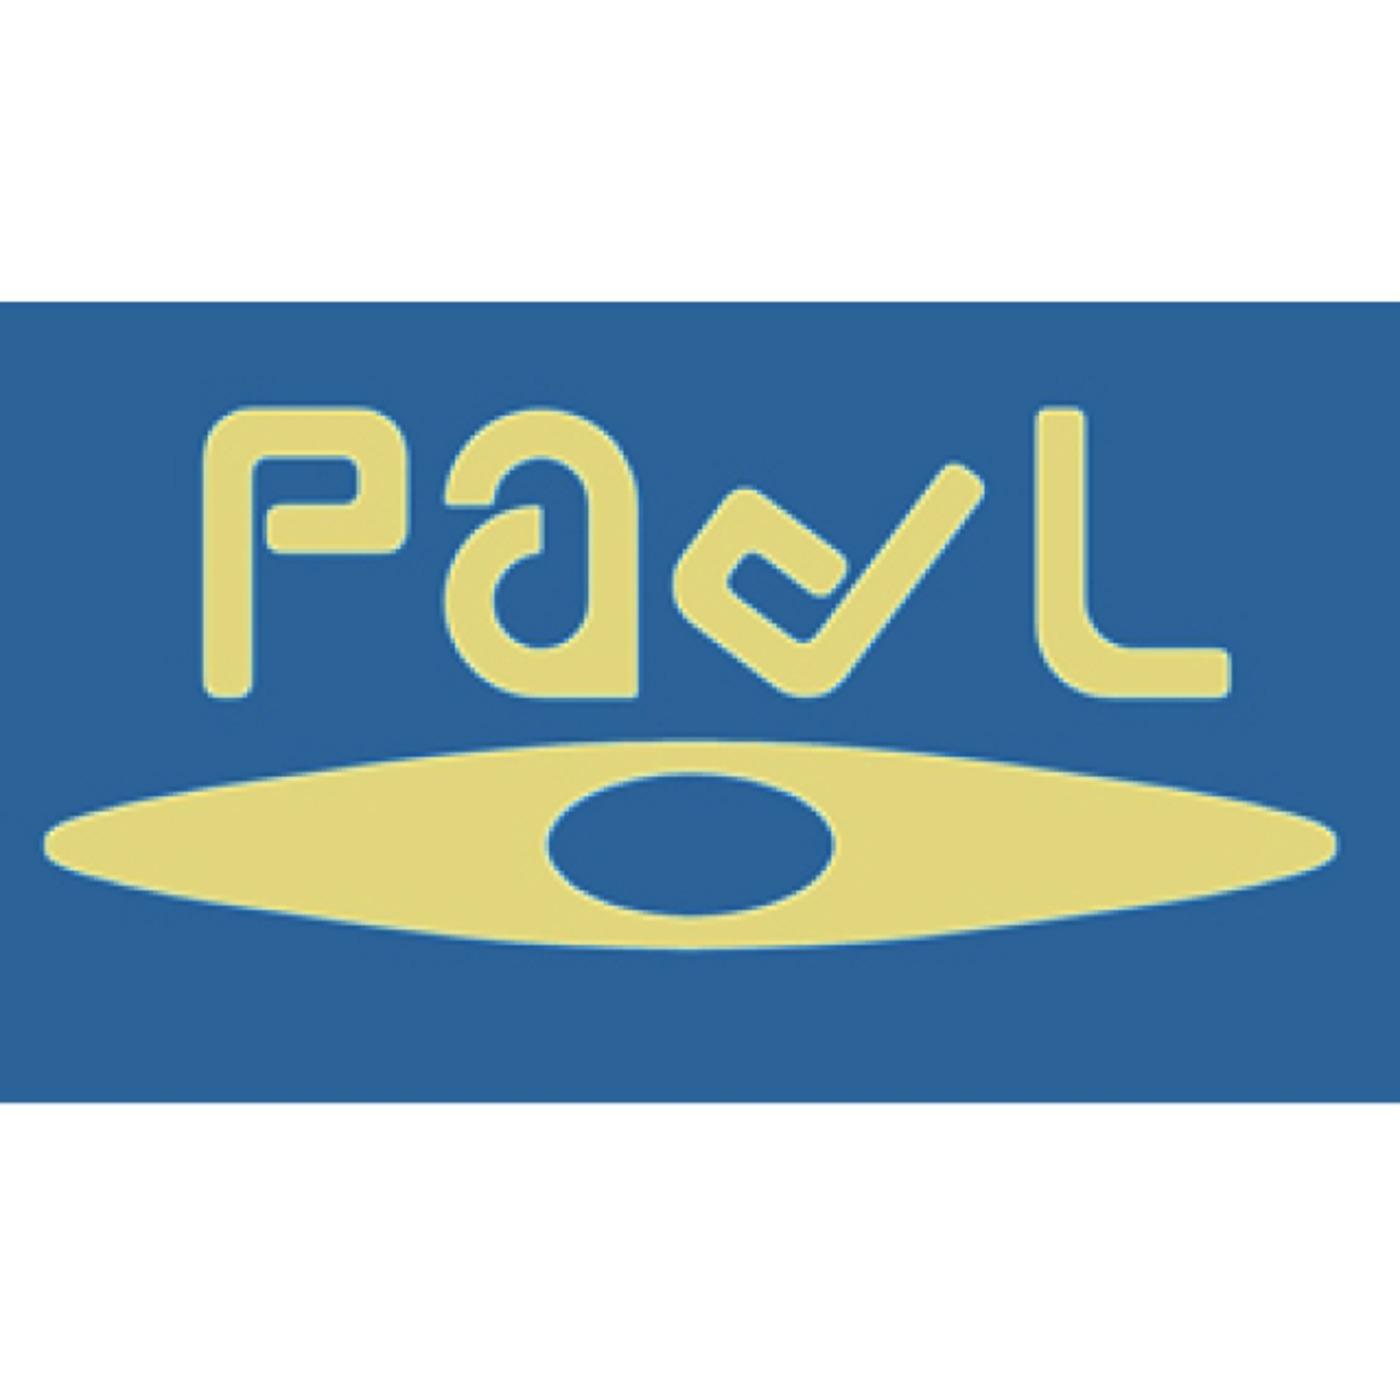 PadL - Les kayaks qui propulsent tes emotions